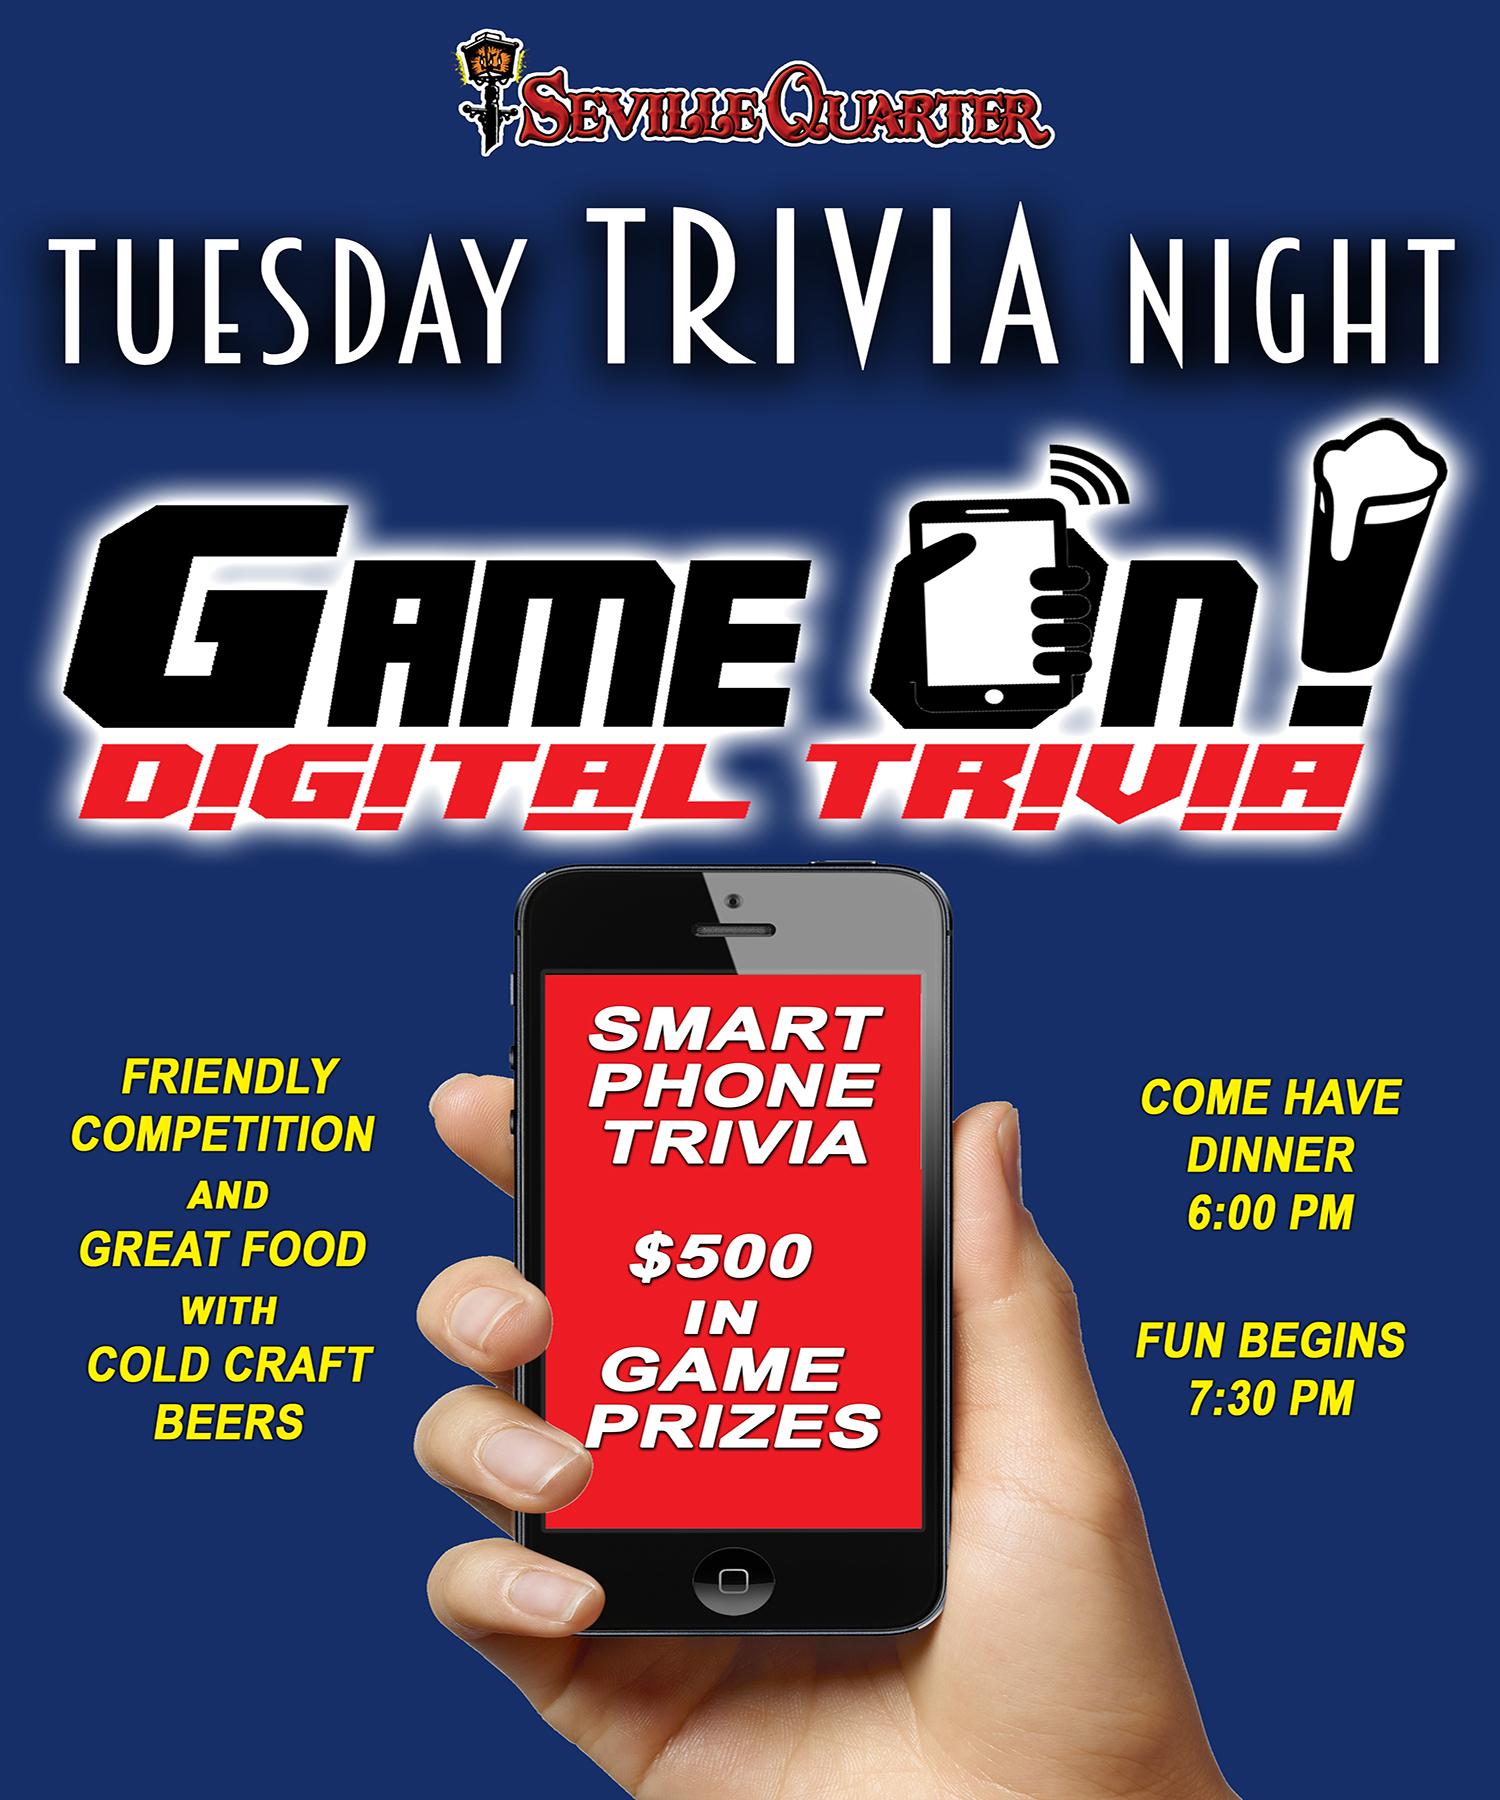 Tuesday digital trivia night